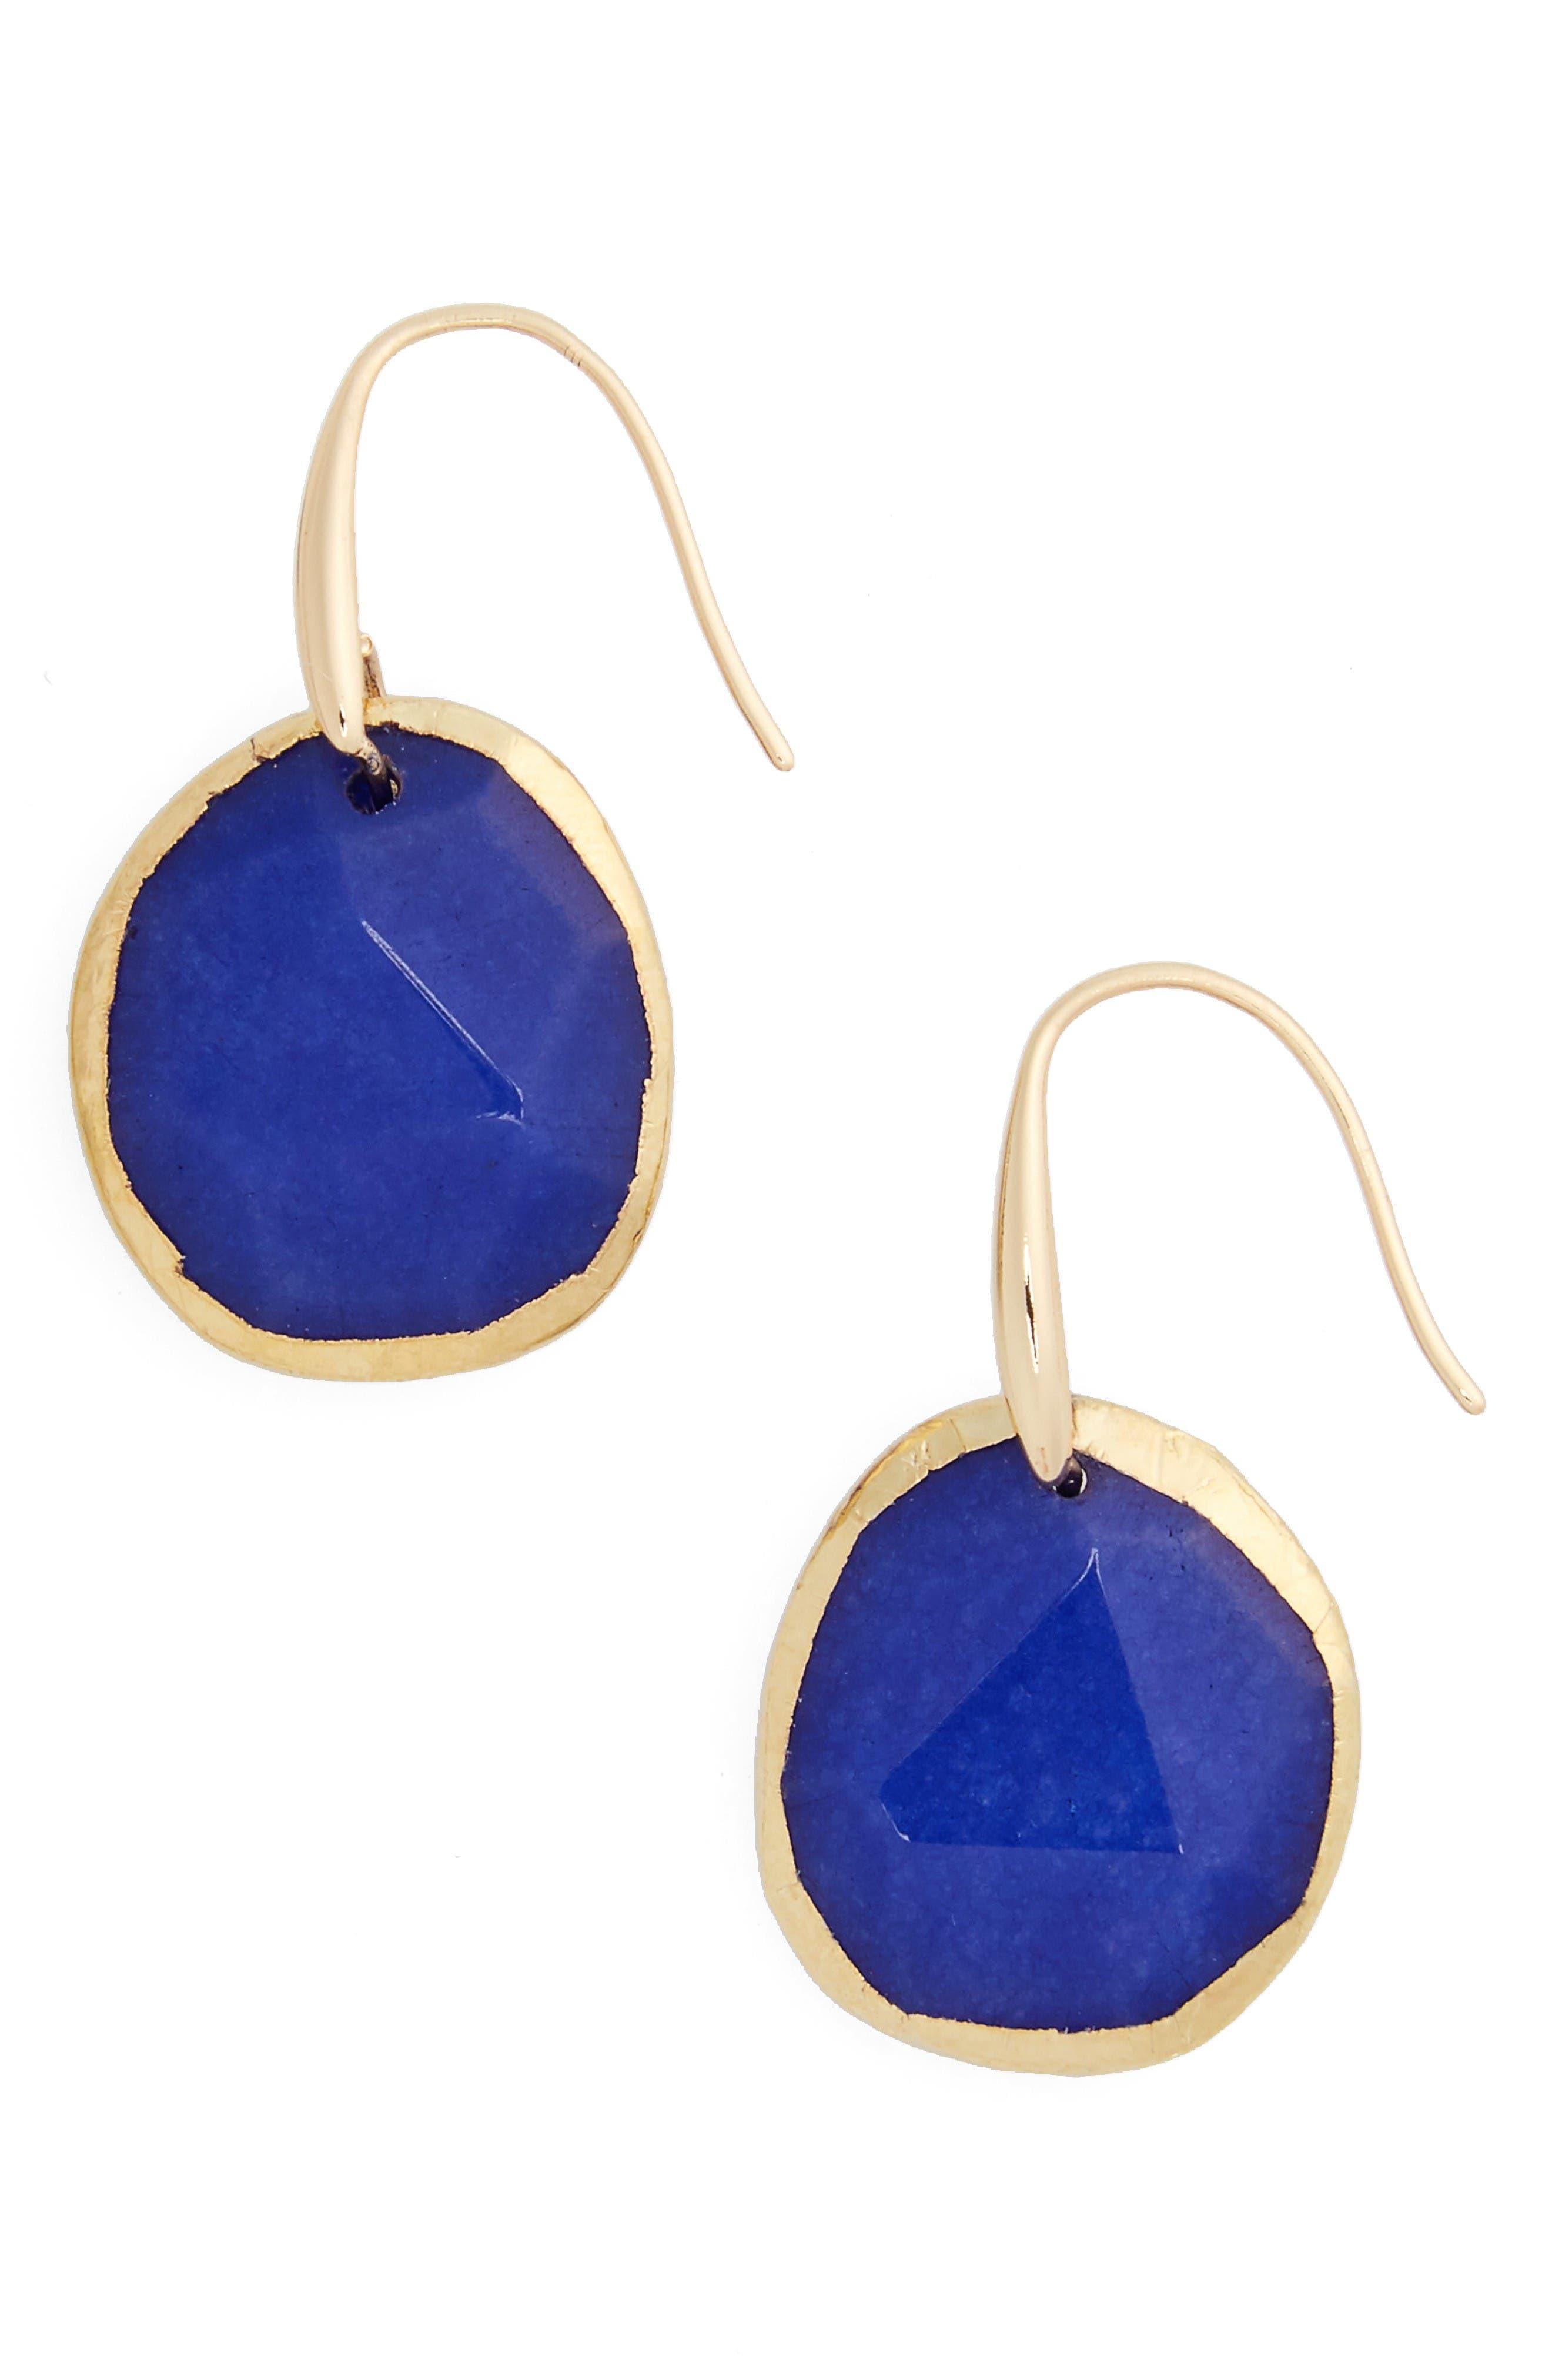 Alternate Image 1 Selected - Nordstrom Semiprecious Stone Drop Earrings